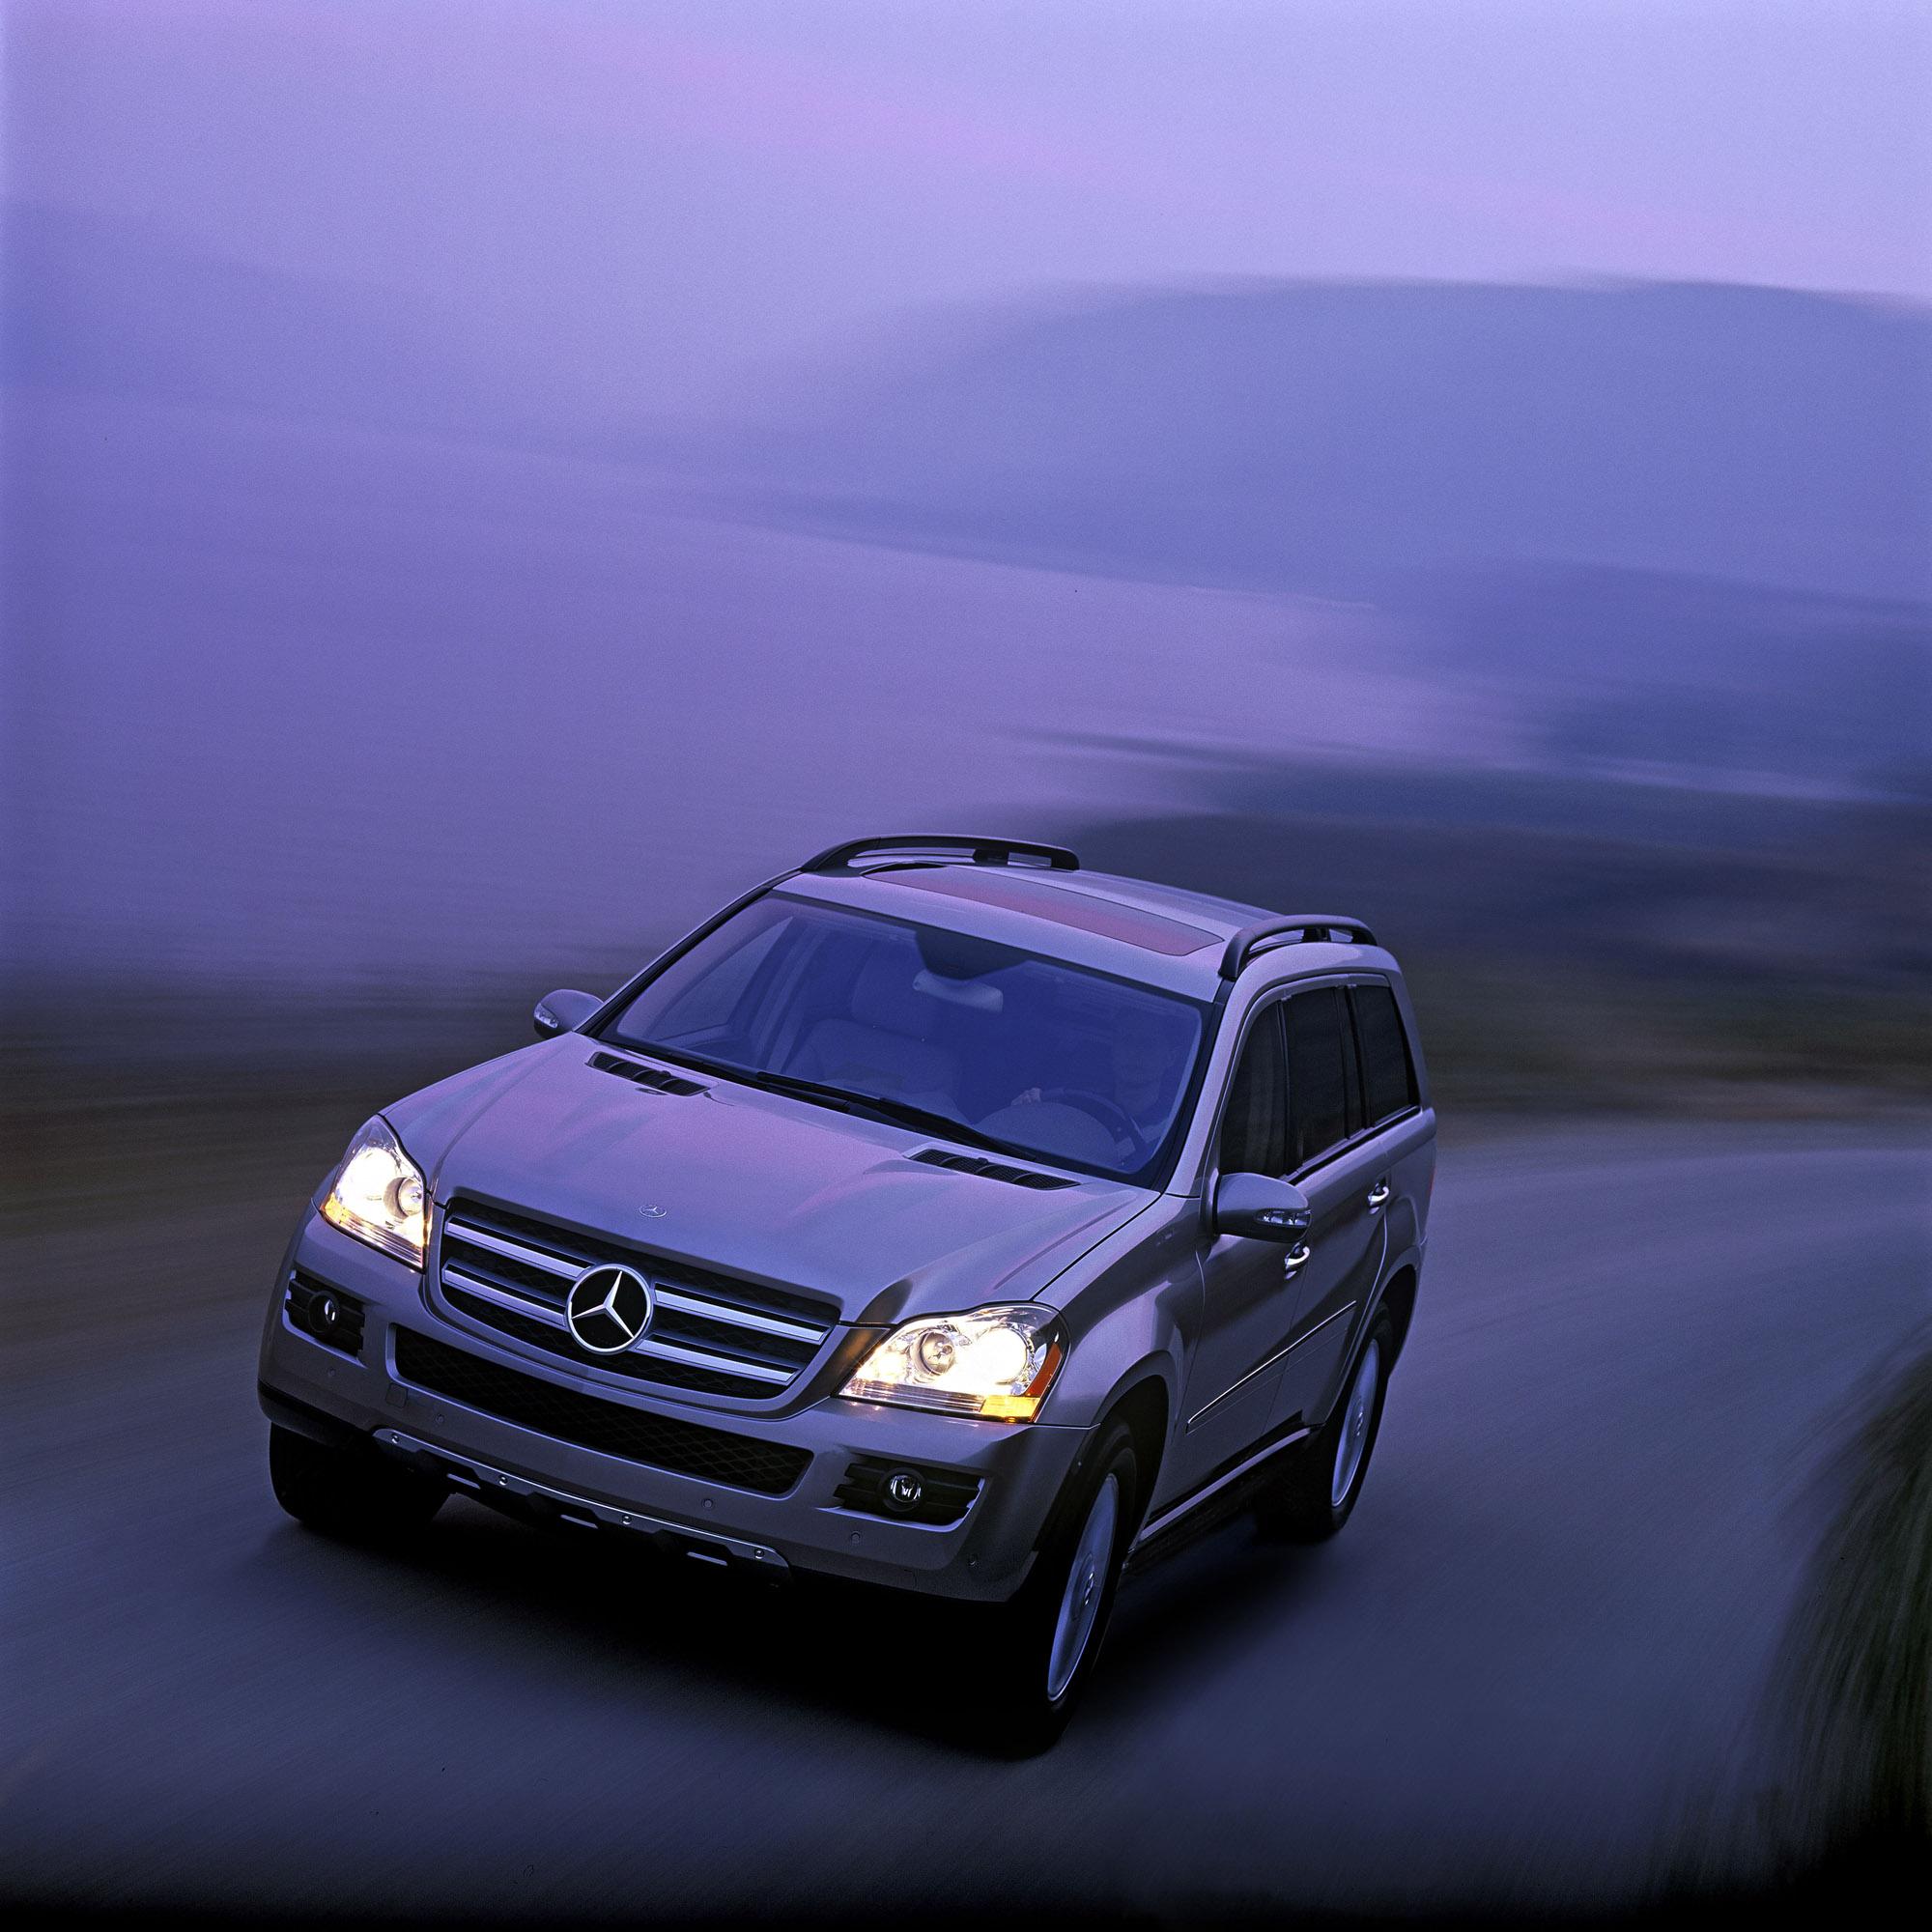 2012 Mercedes Benz Gl Class Camshaft: 2012 Ram 1500 Laramie Limited